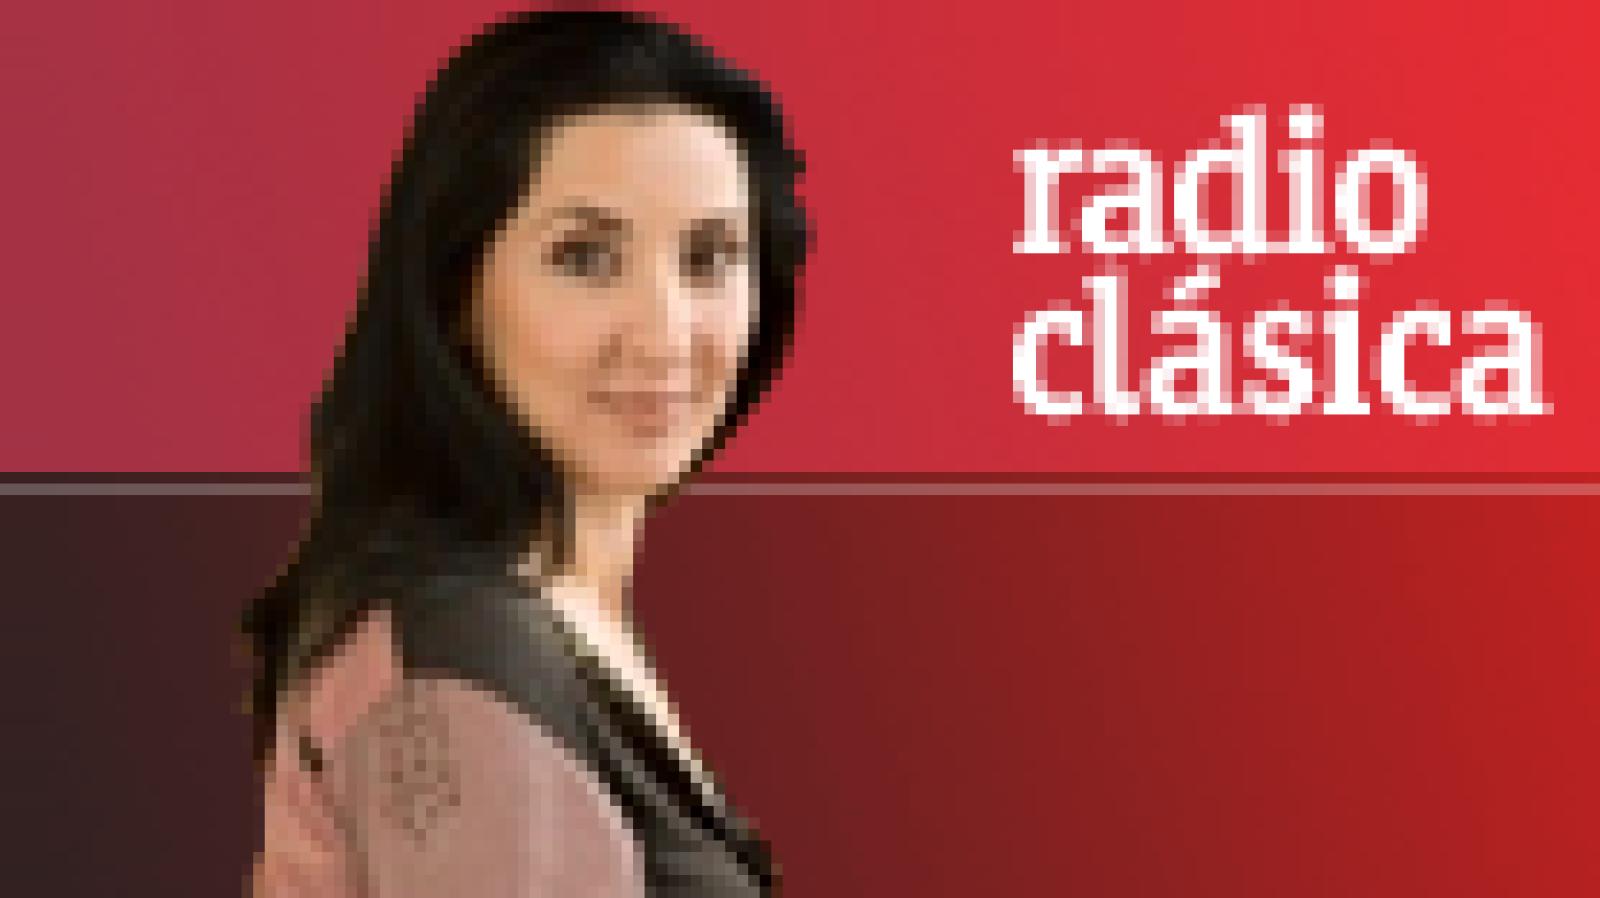 Radiofonías - Ciudades Invisibles (I) - 15/12/11 - escuchar ahora